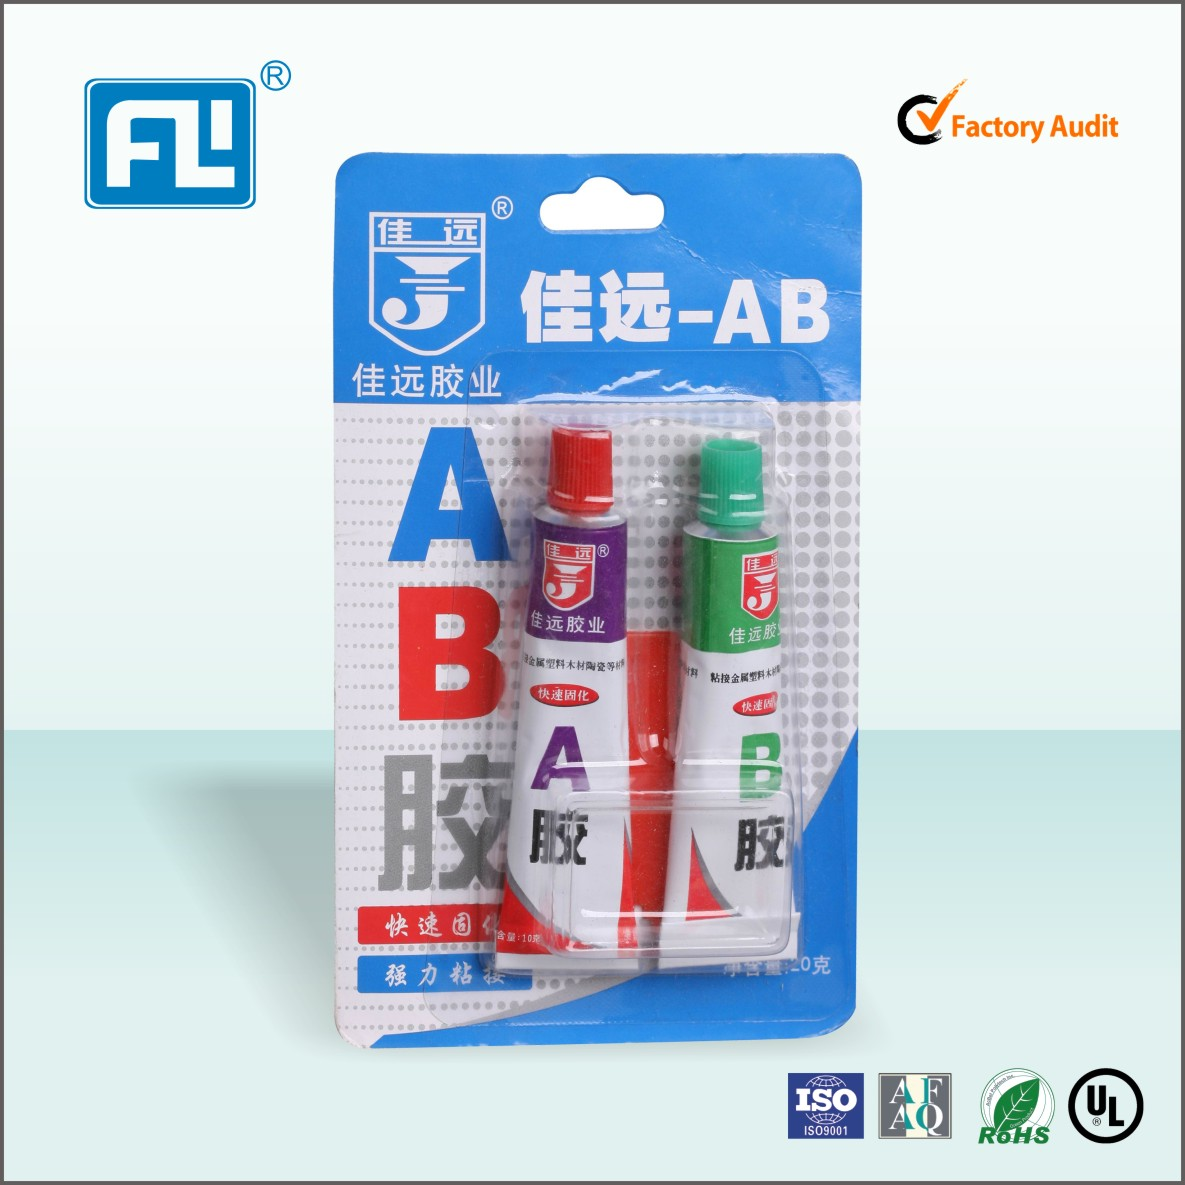 Best quality construction epoxy resin ab glue for ceramic tile best quality construction epoxy resin ab glue for ceramic tile dailygadgetfo Images